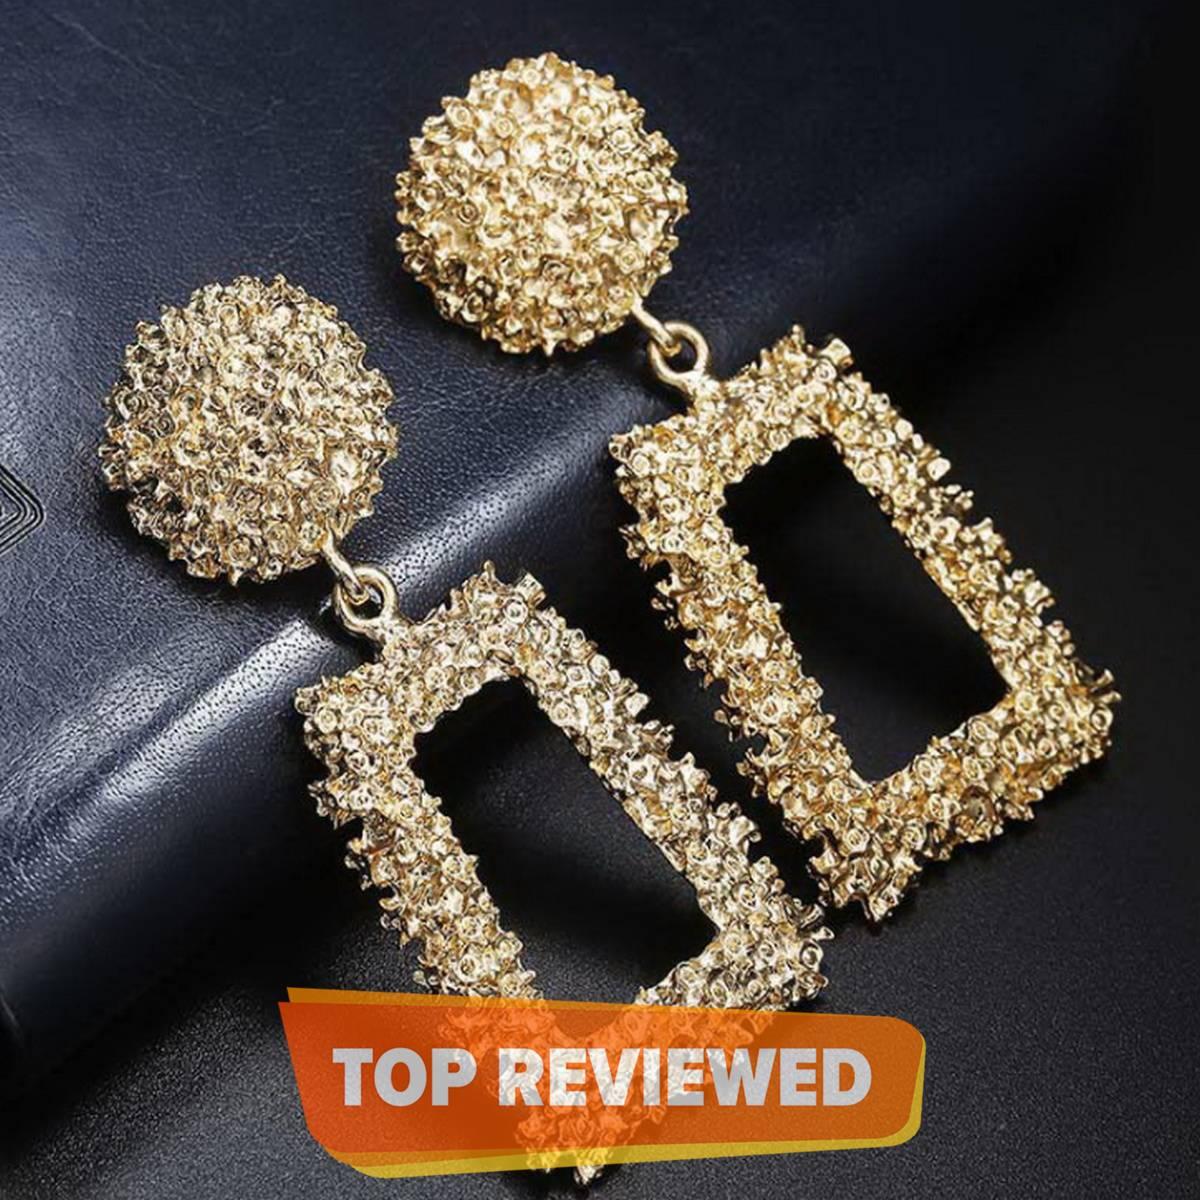 Vintage Metal Geometric Statement Earrings Set for Women - Female Fashion Jewelry